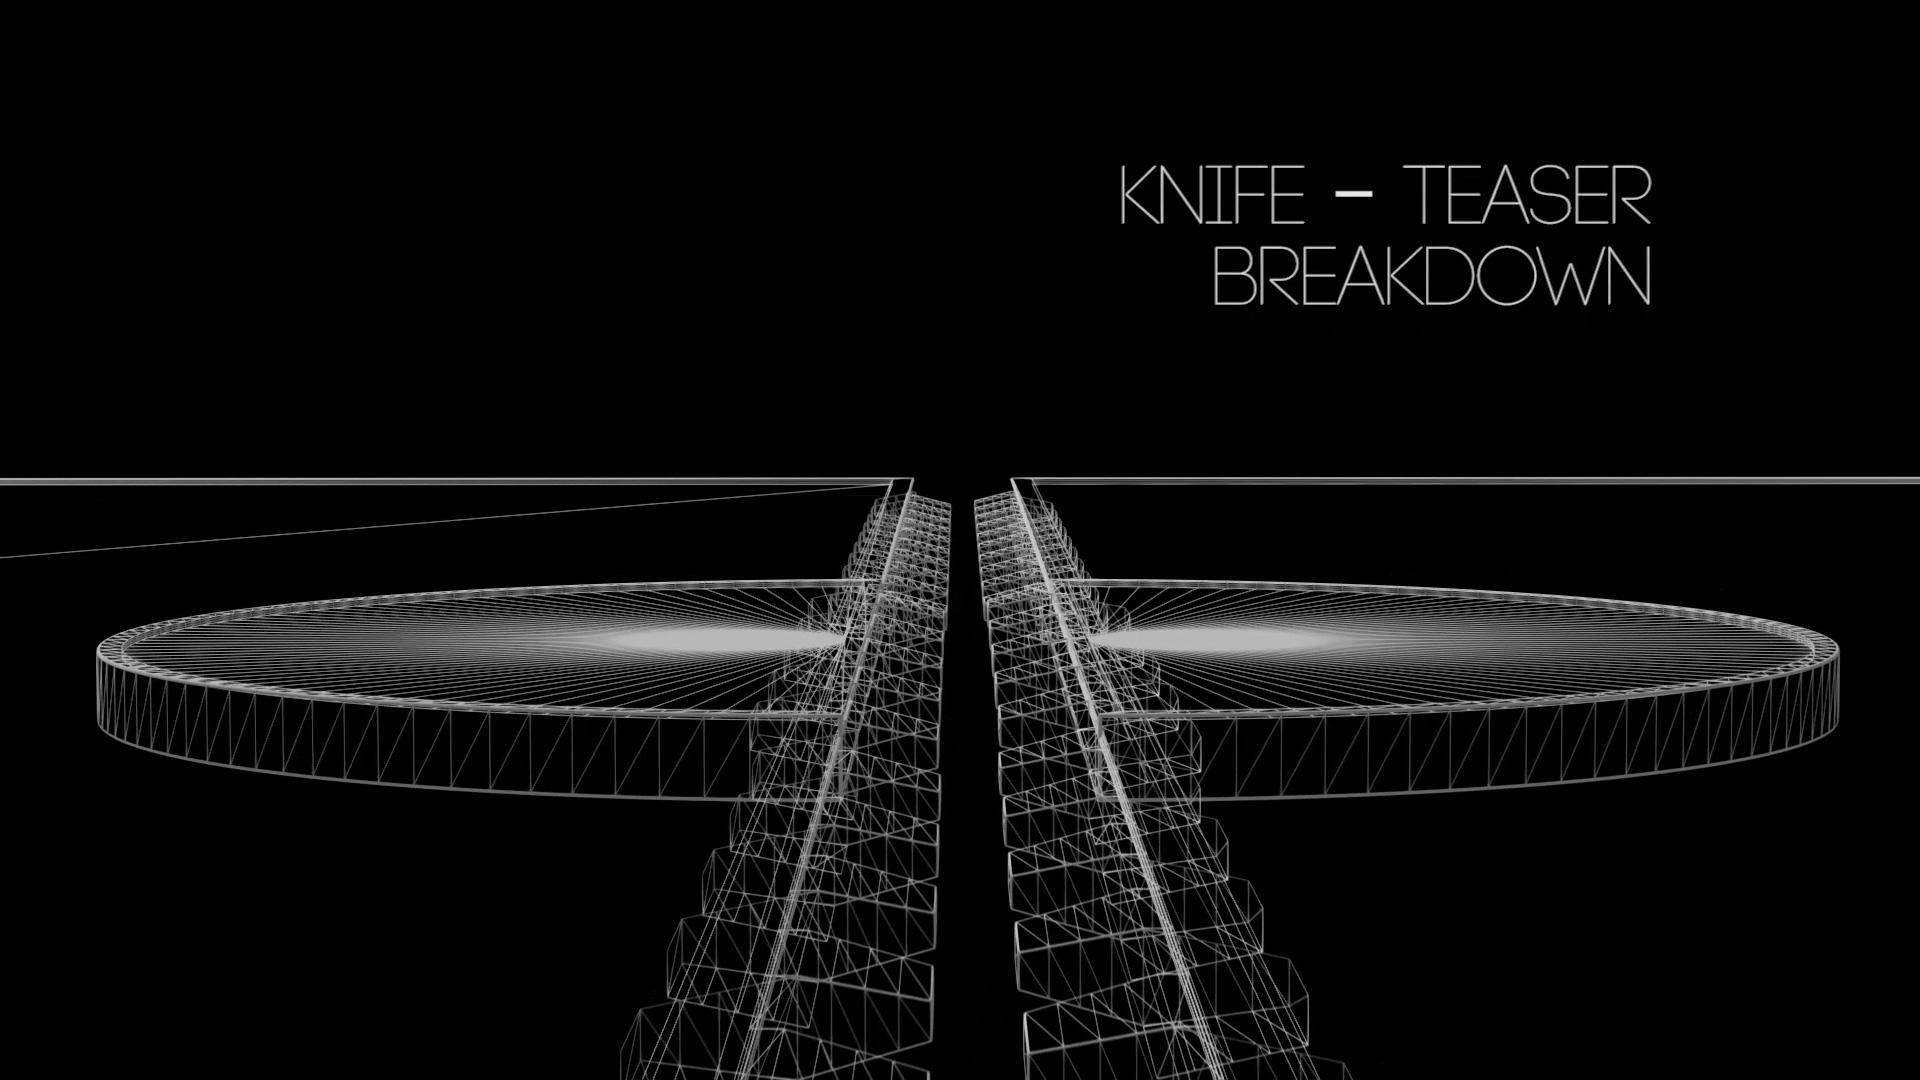 KNIFE-TeaserBreak_Thumb.jpg